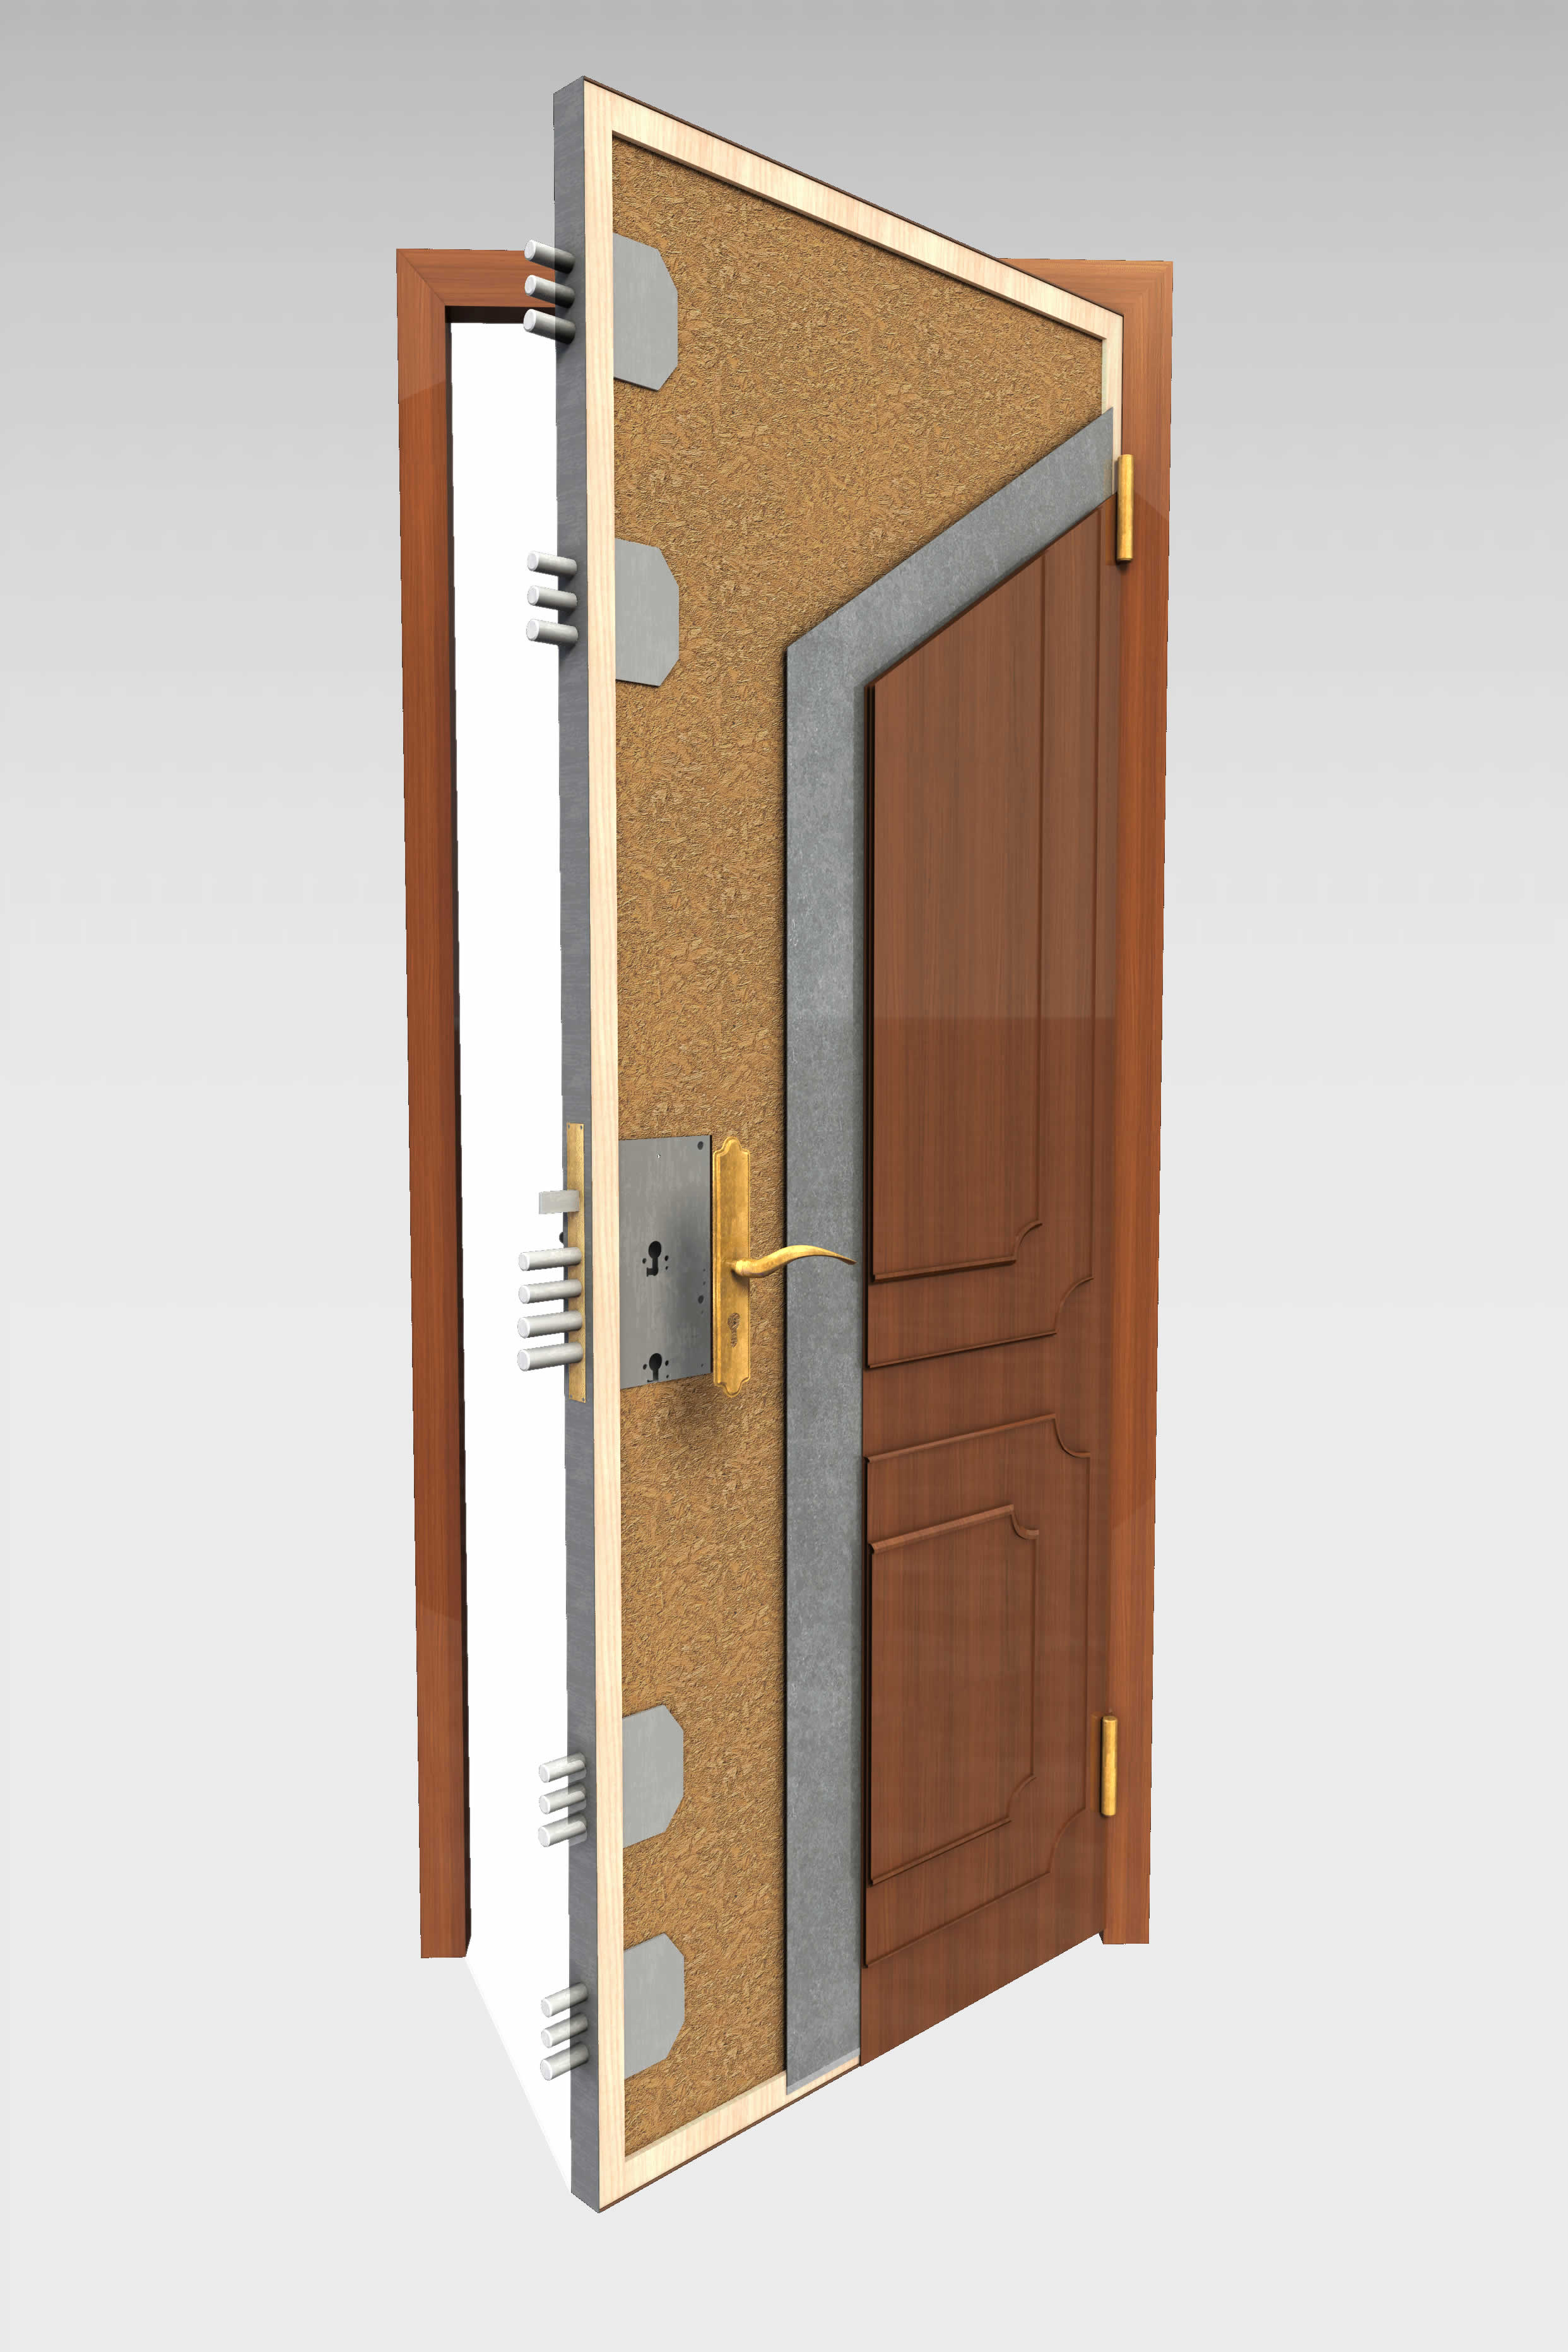 Puerta blindada b 16 roconsa - Precio puerta blindada instalada ...